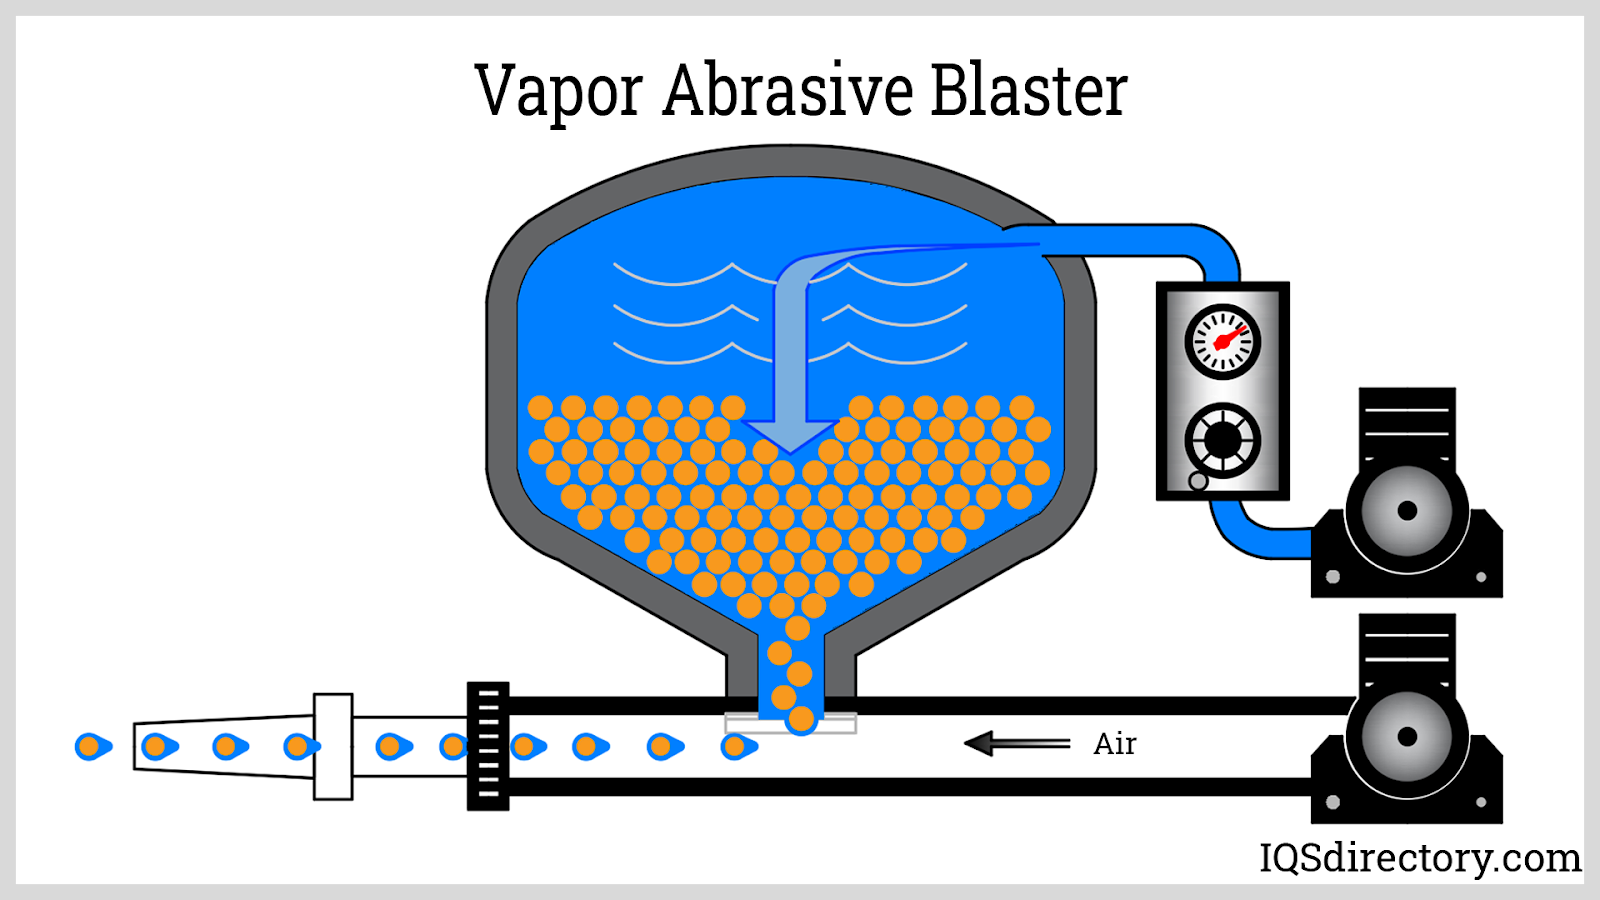 Vapor Abrasive Blaster